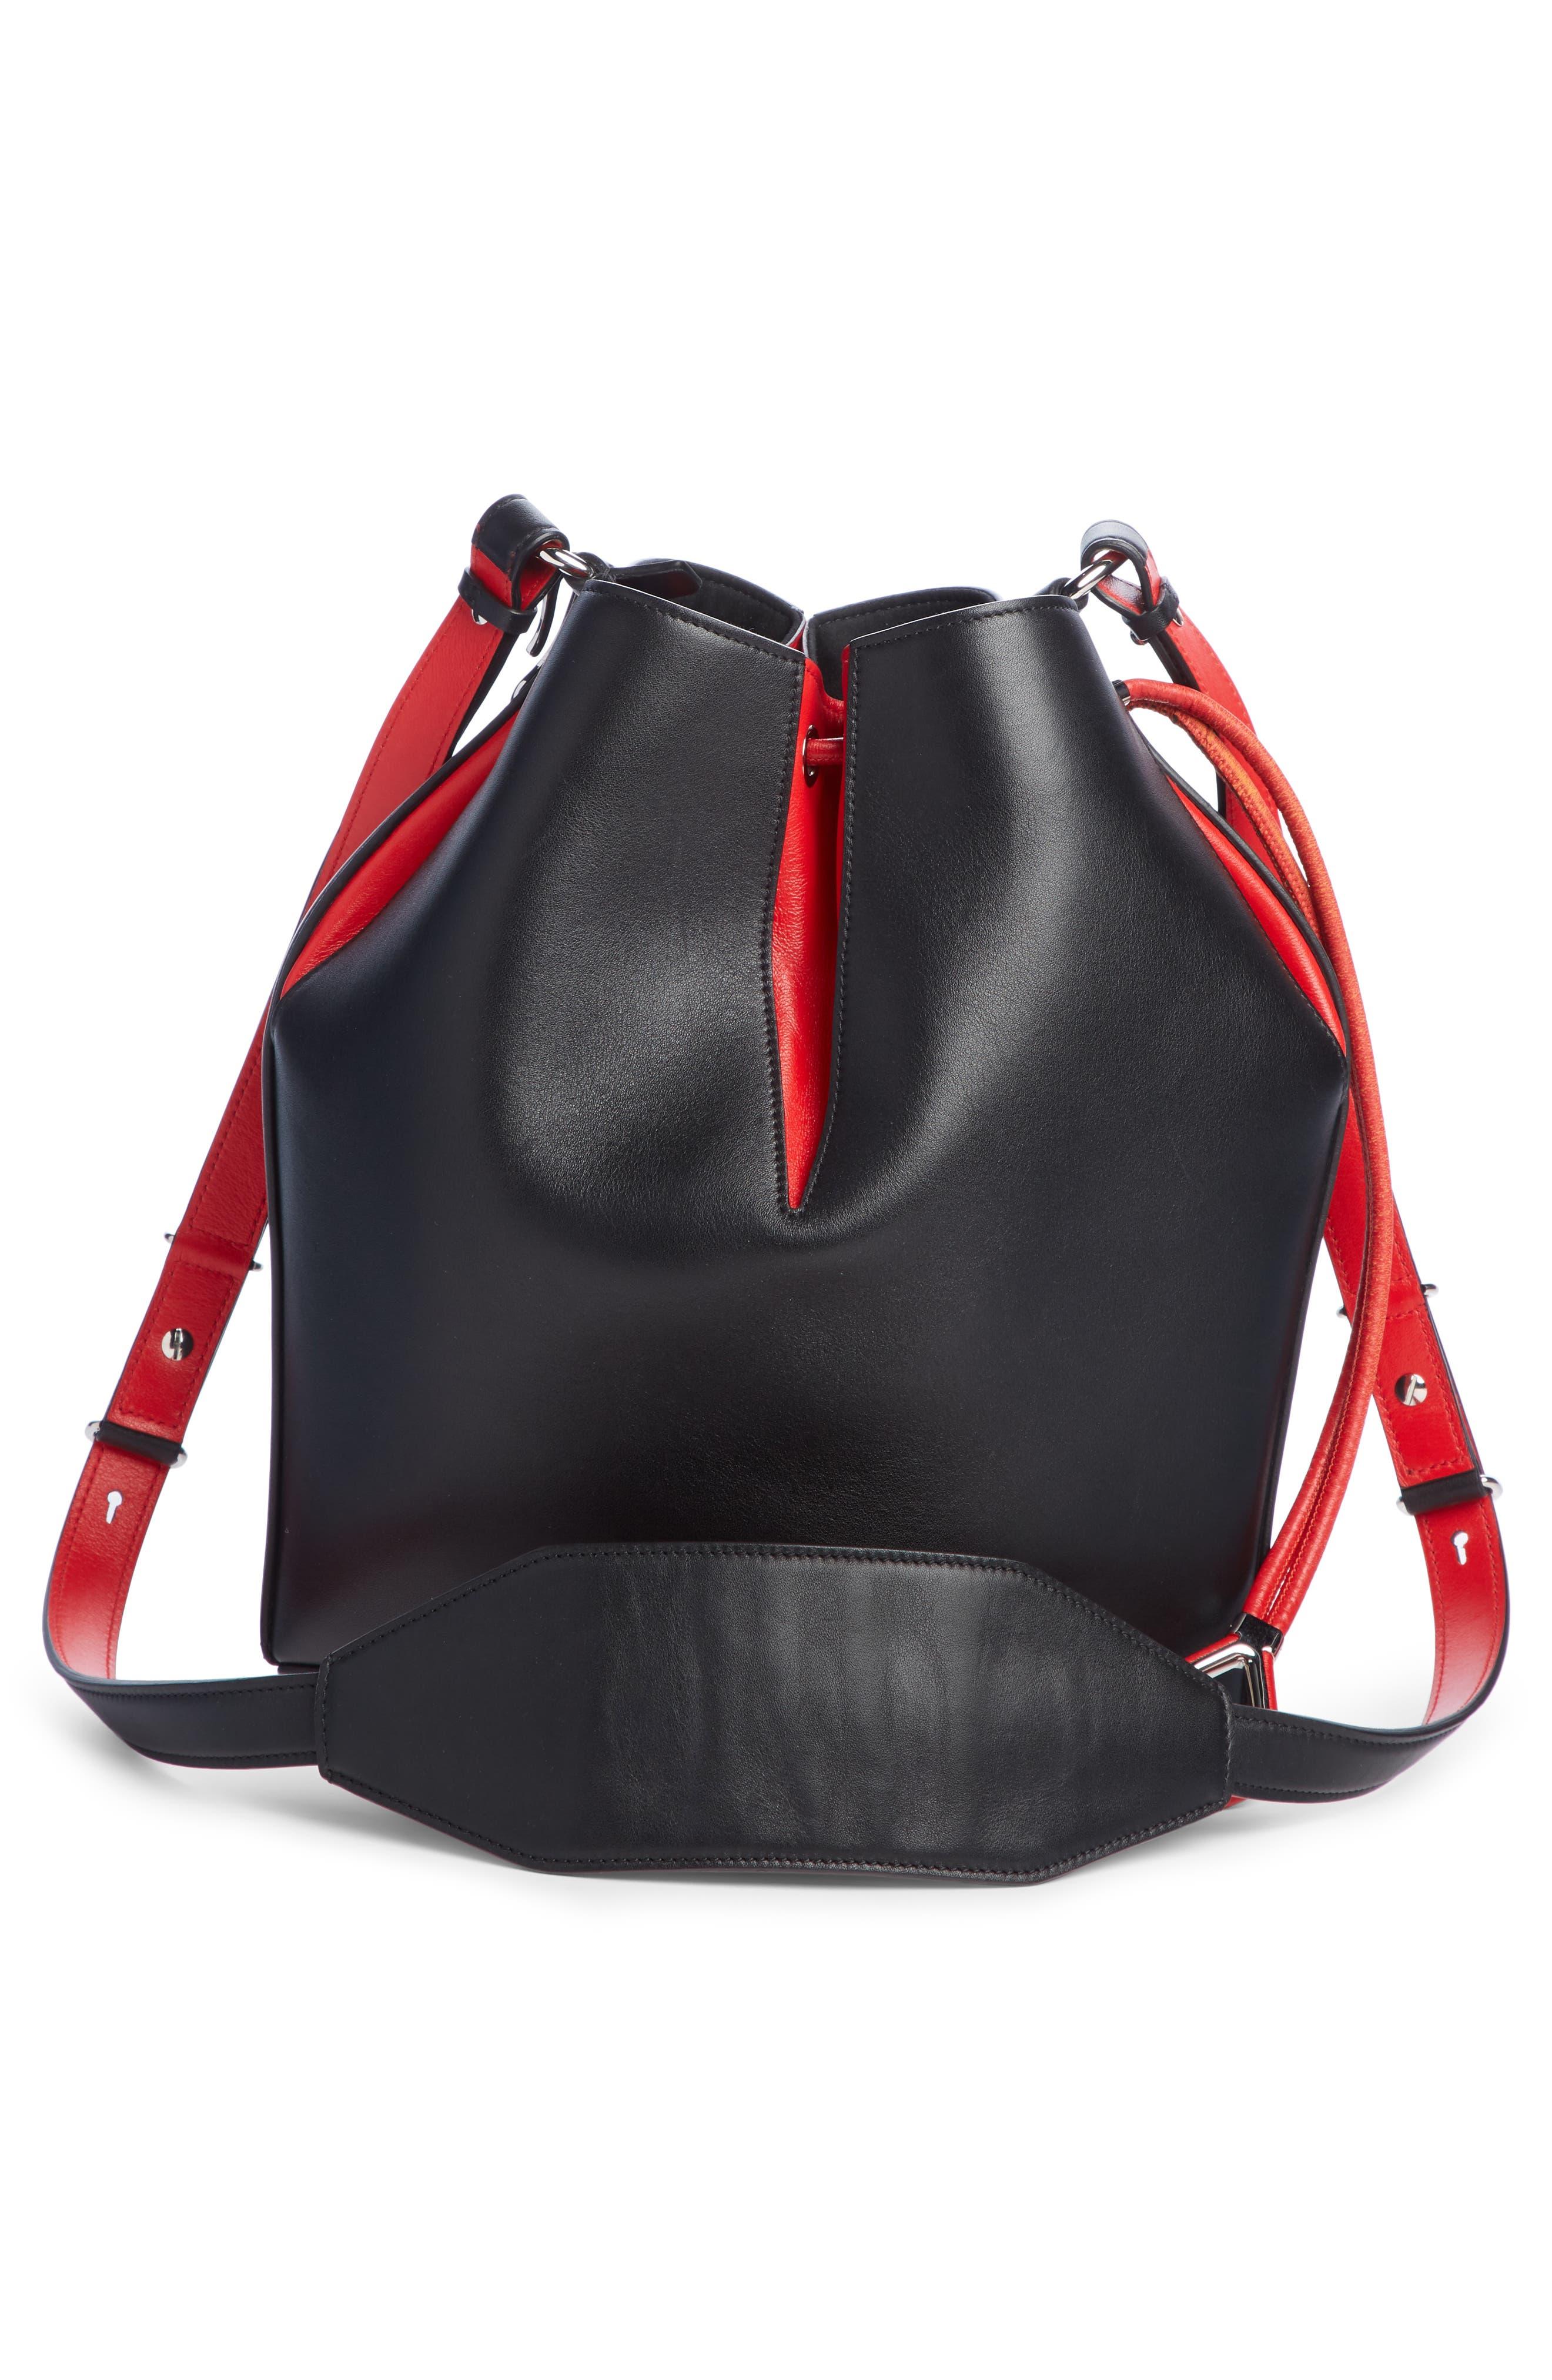 Bicolor Leather Bucket Bag,                             Alternate thumbnail 3, color,                             BLACK/ LUST RED